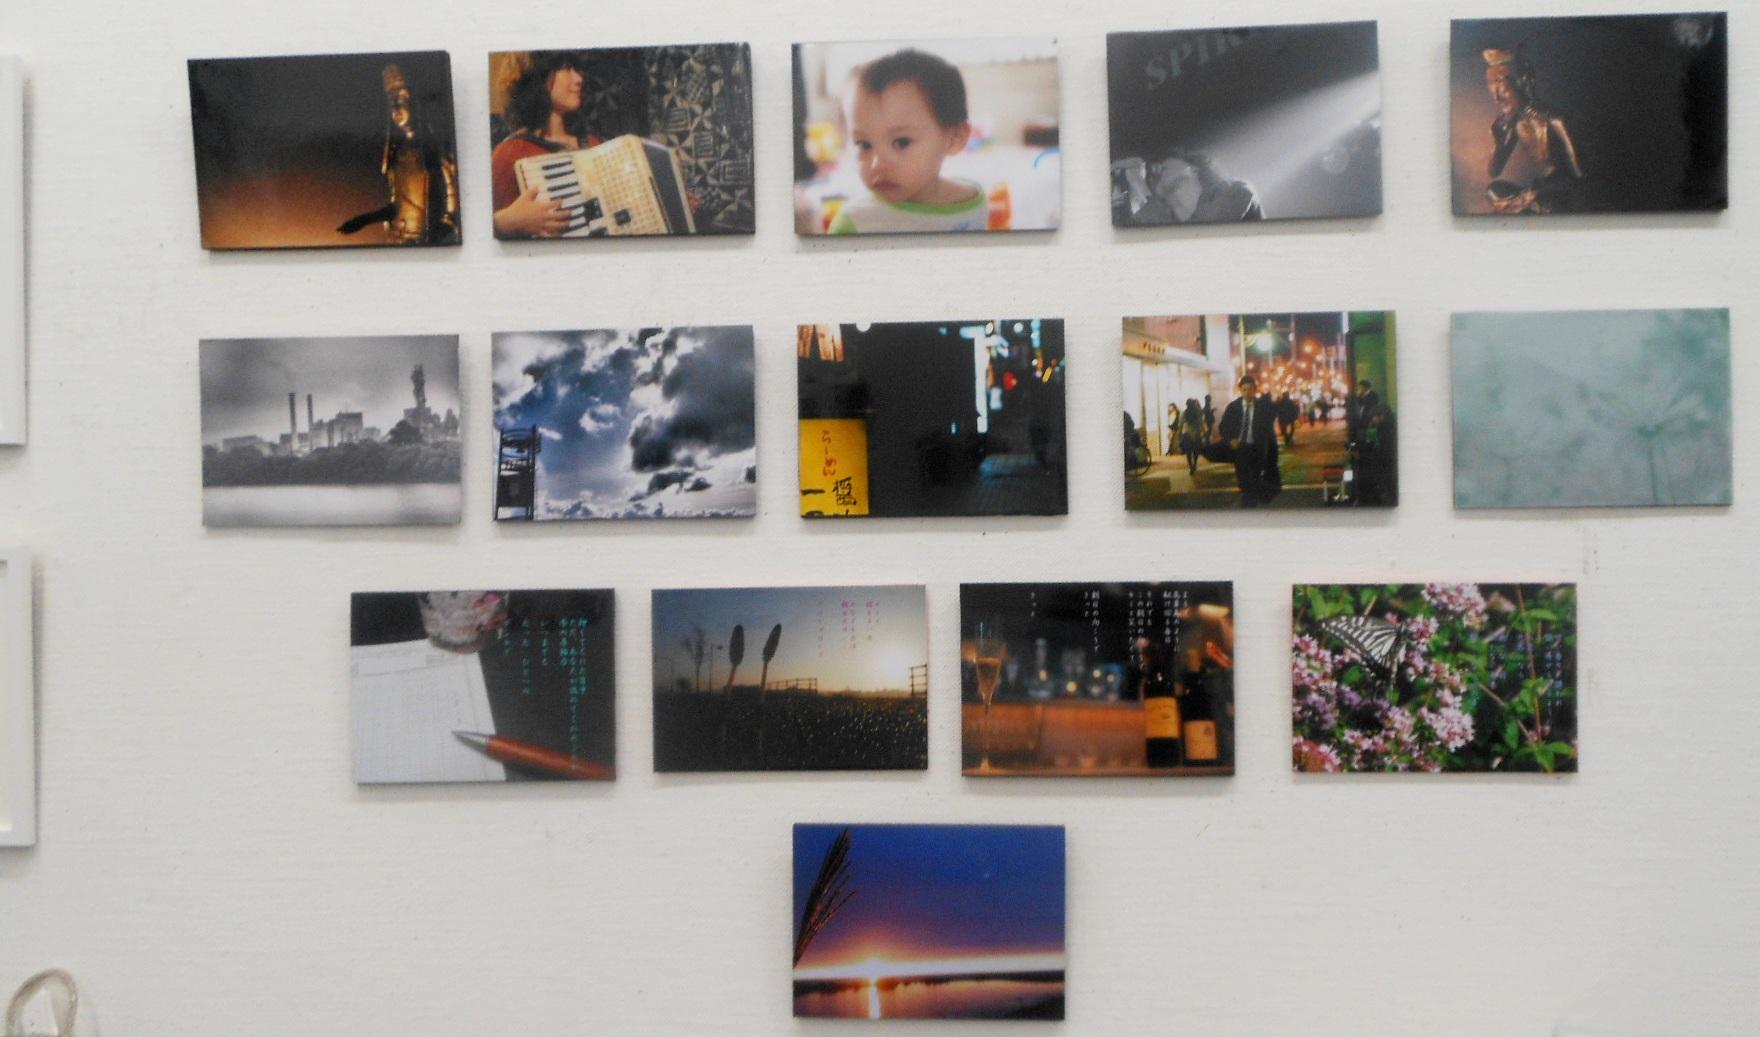 1888)③「写真クラブ「BePHaT!!」 第9回作品展 『夢 Photo 2012』」市民g. 終了11月21日(水)~11月25日(日)_f0126829_151916.jpg